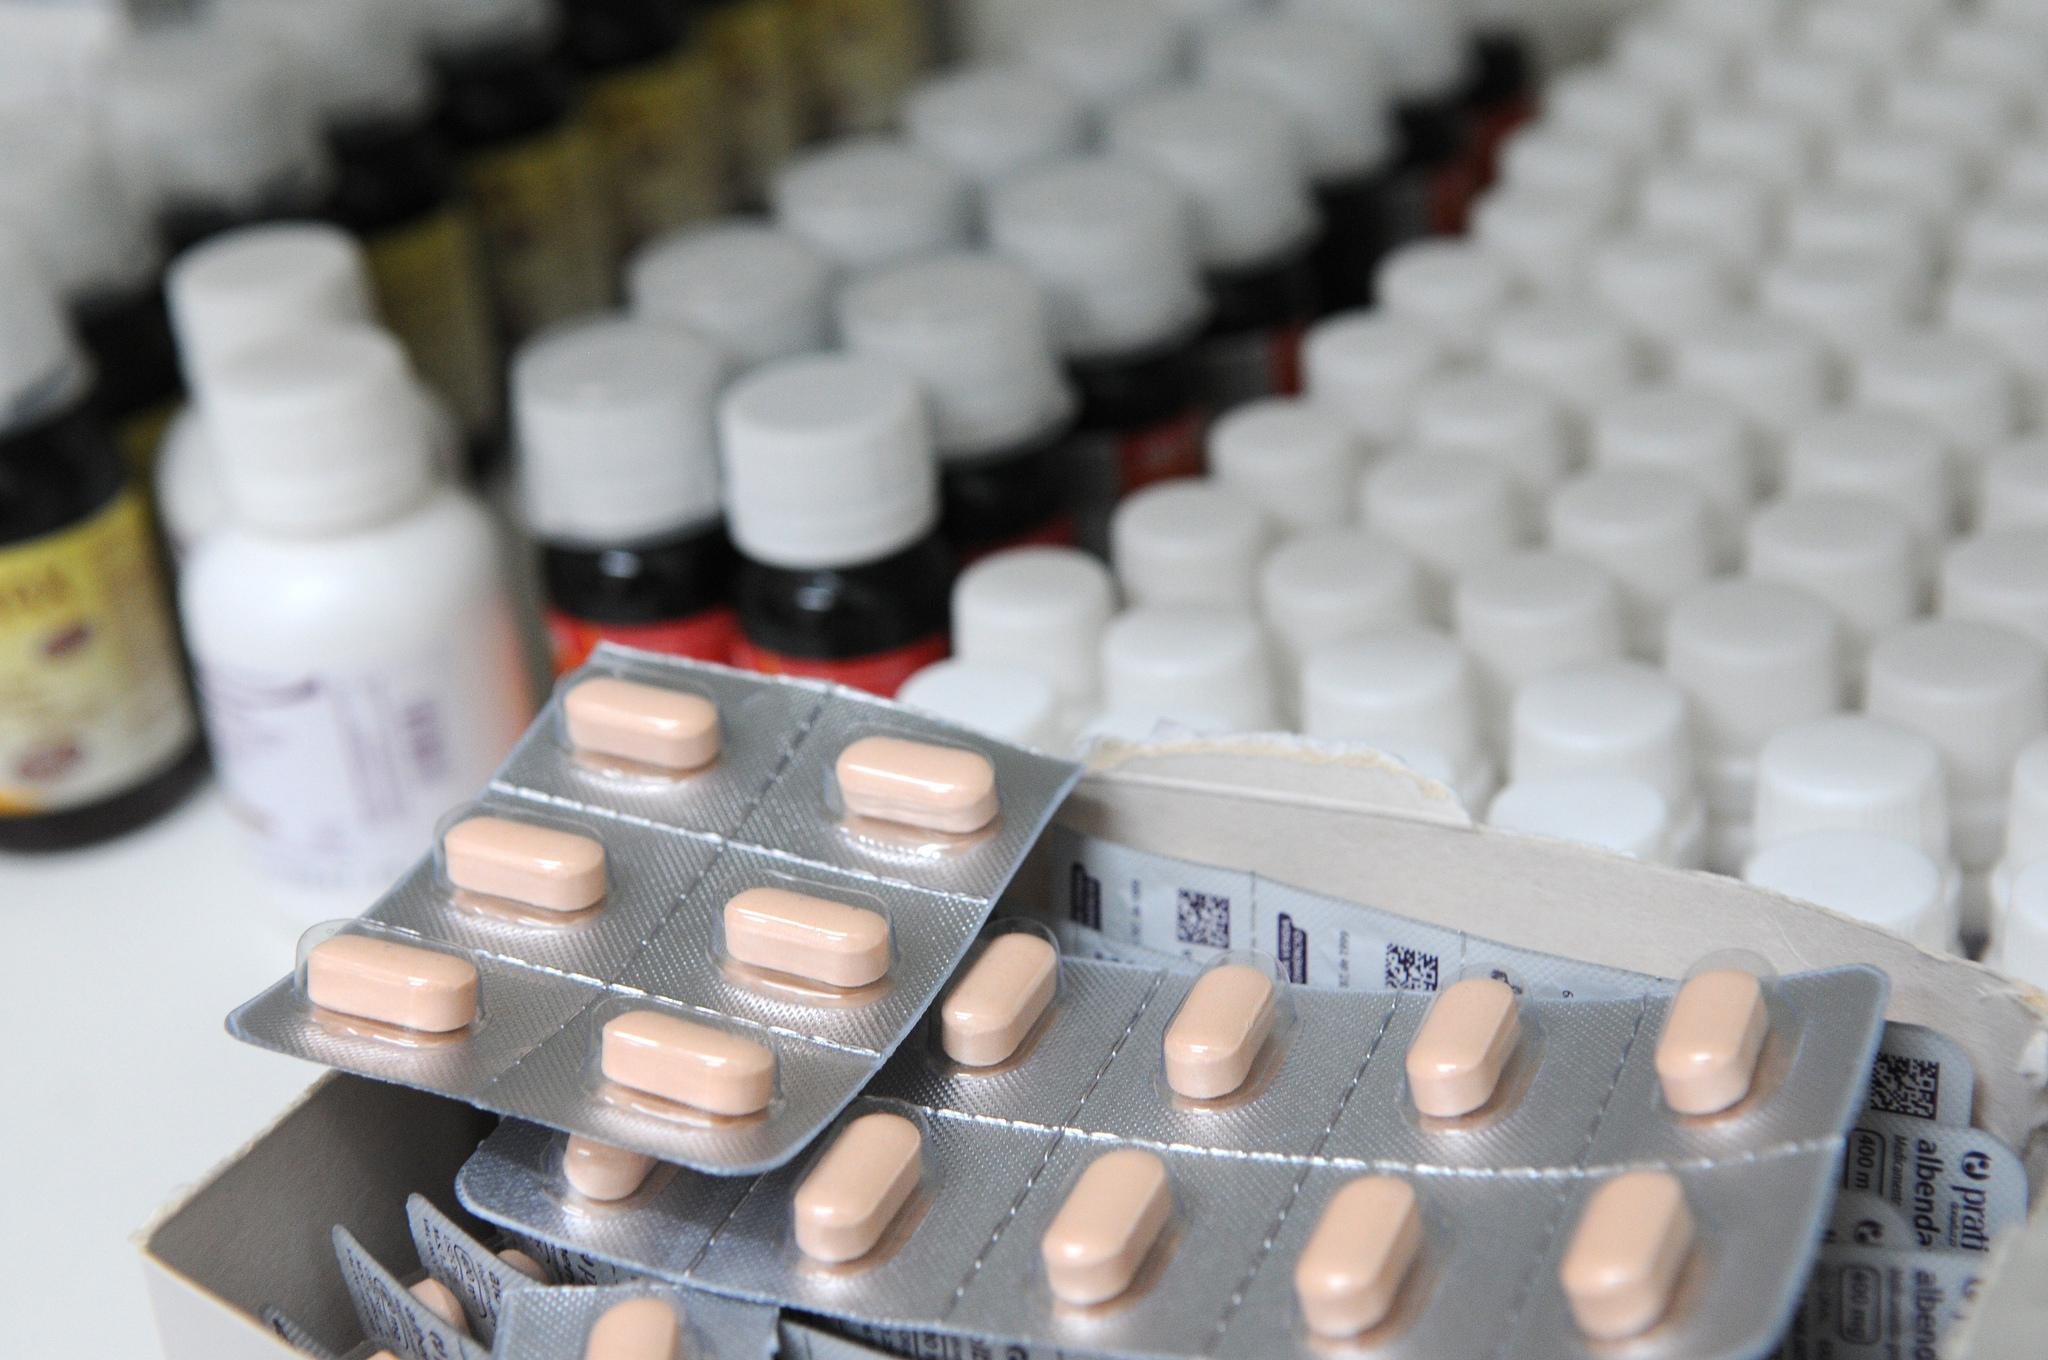 Saúde - remédios - medicamentos